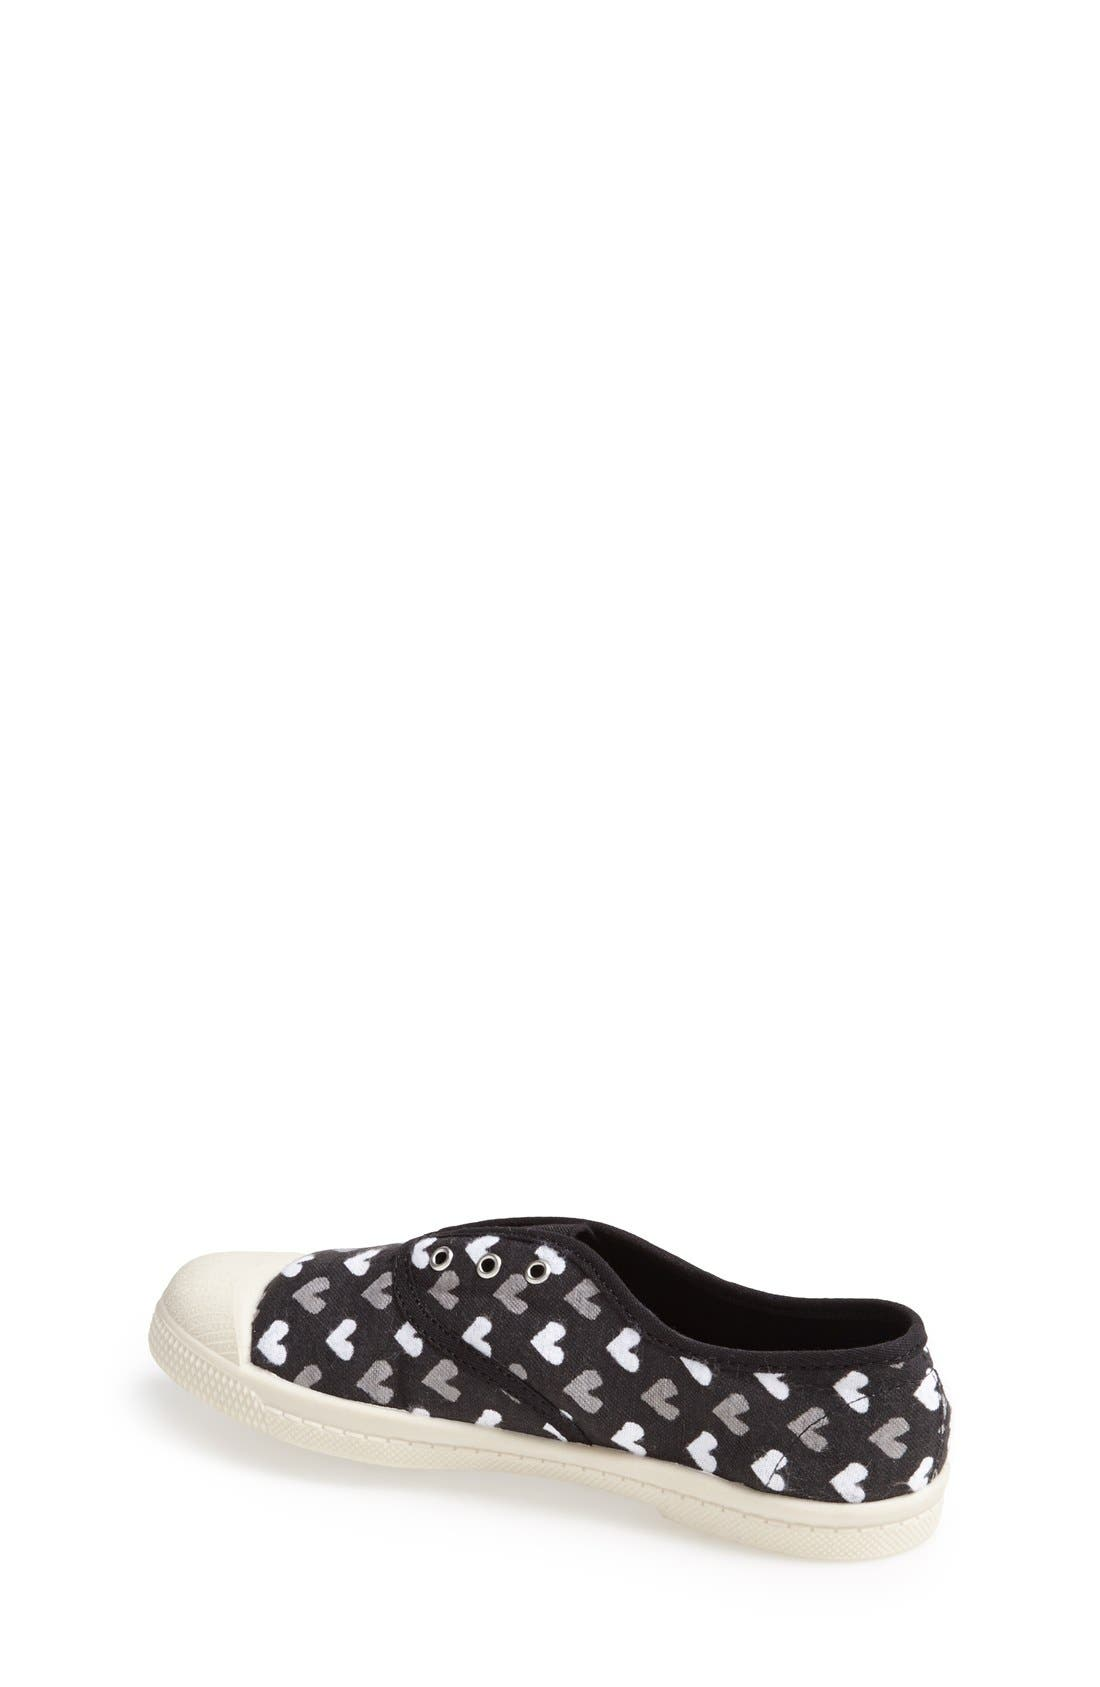 'Marin' Canvas Slip-On Sneaker,                             Alternate thumbnail 2, color,                             001